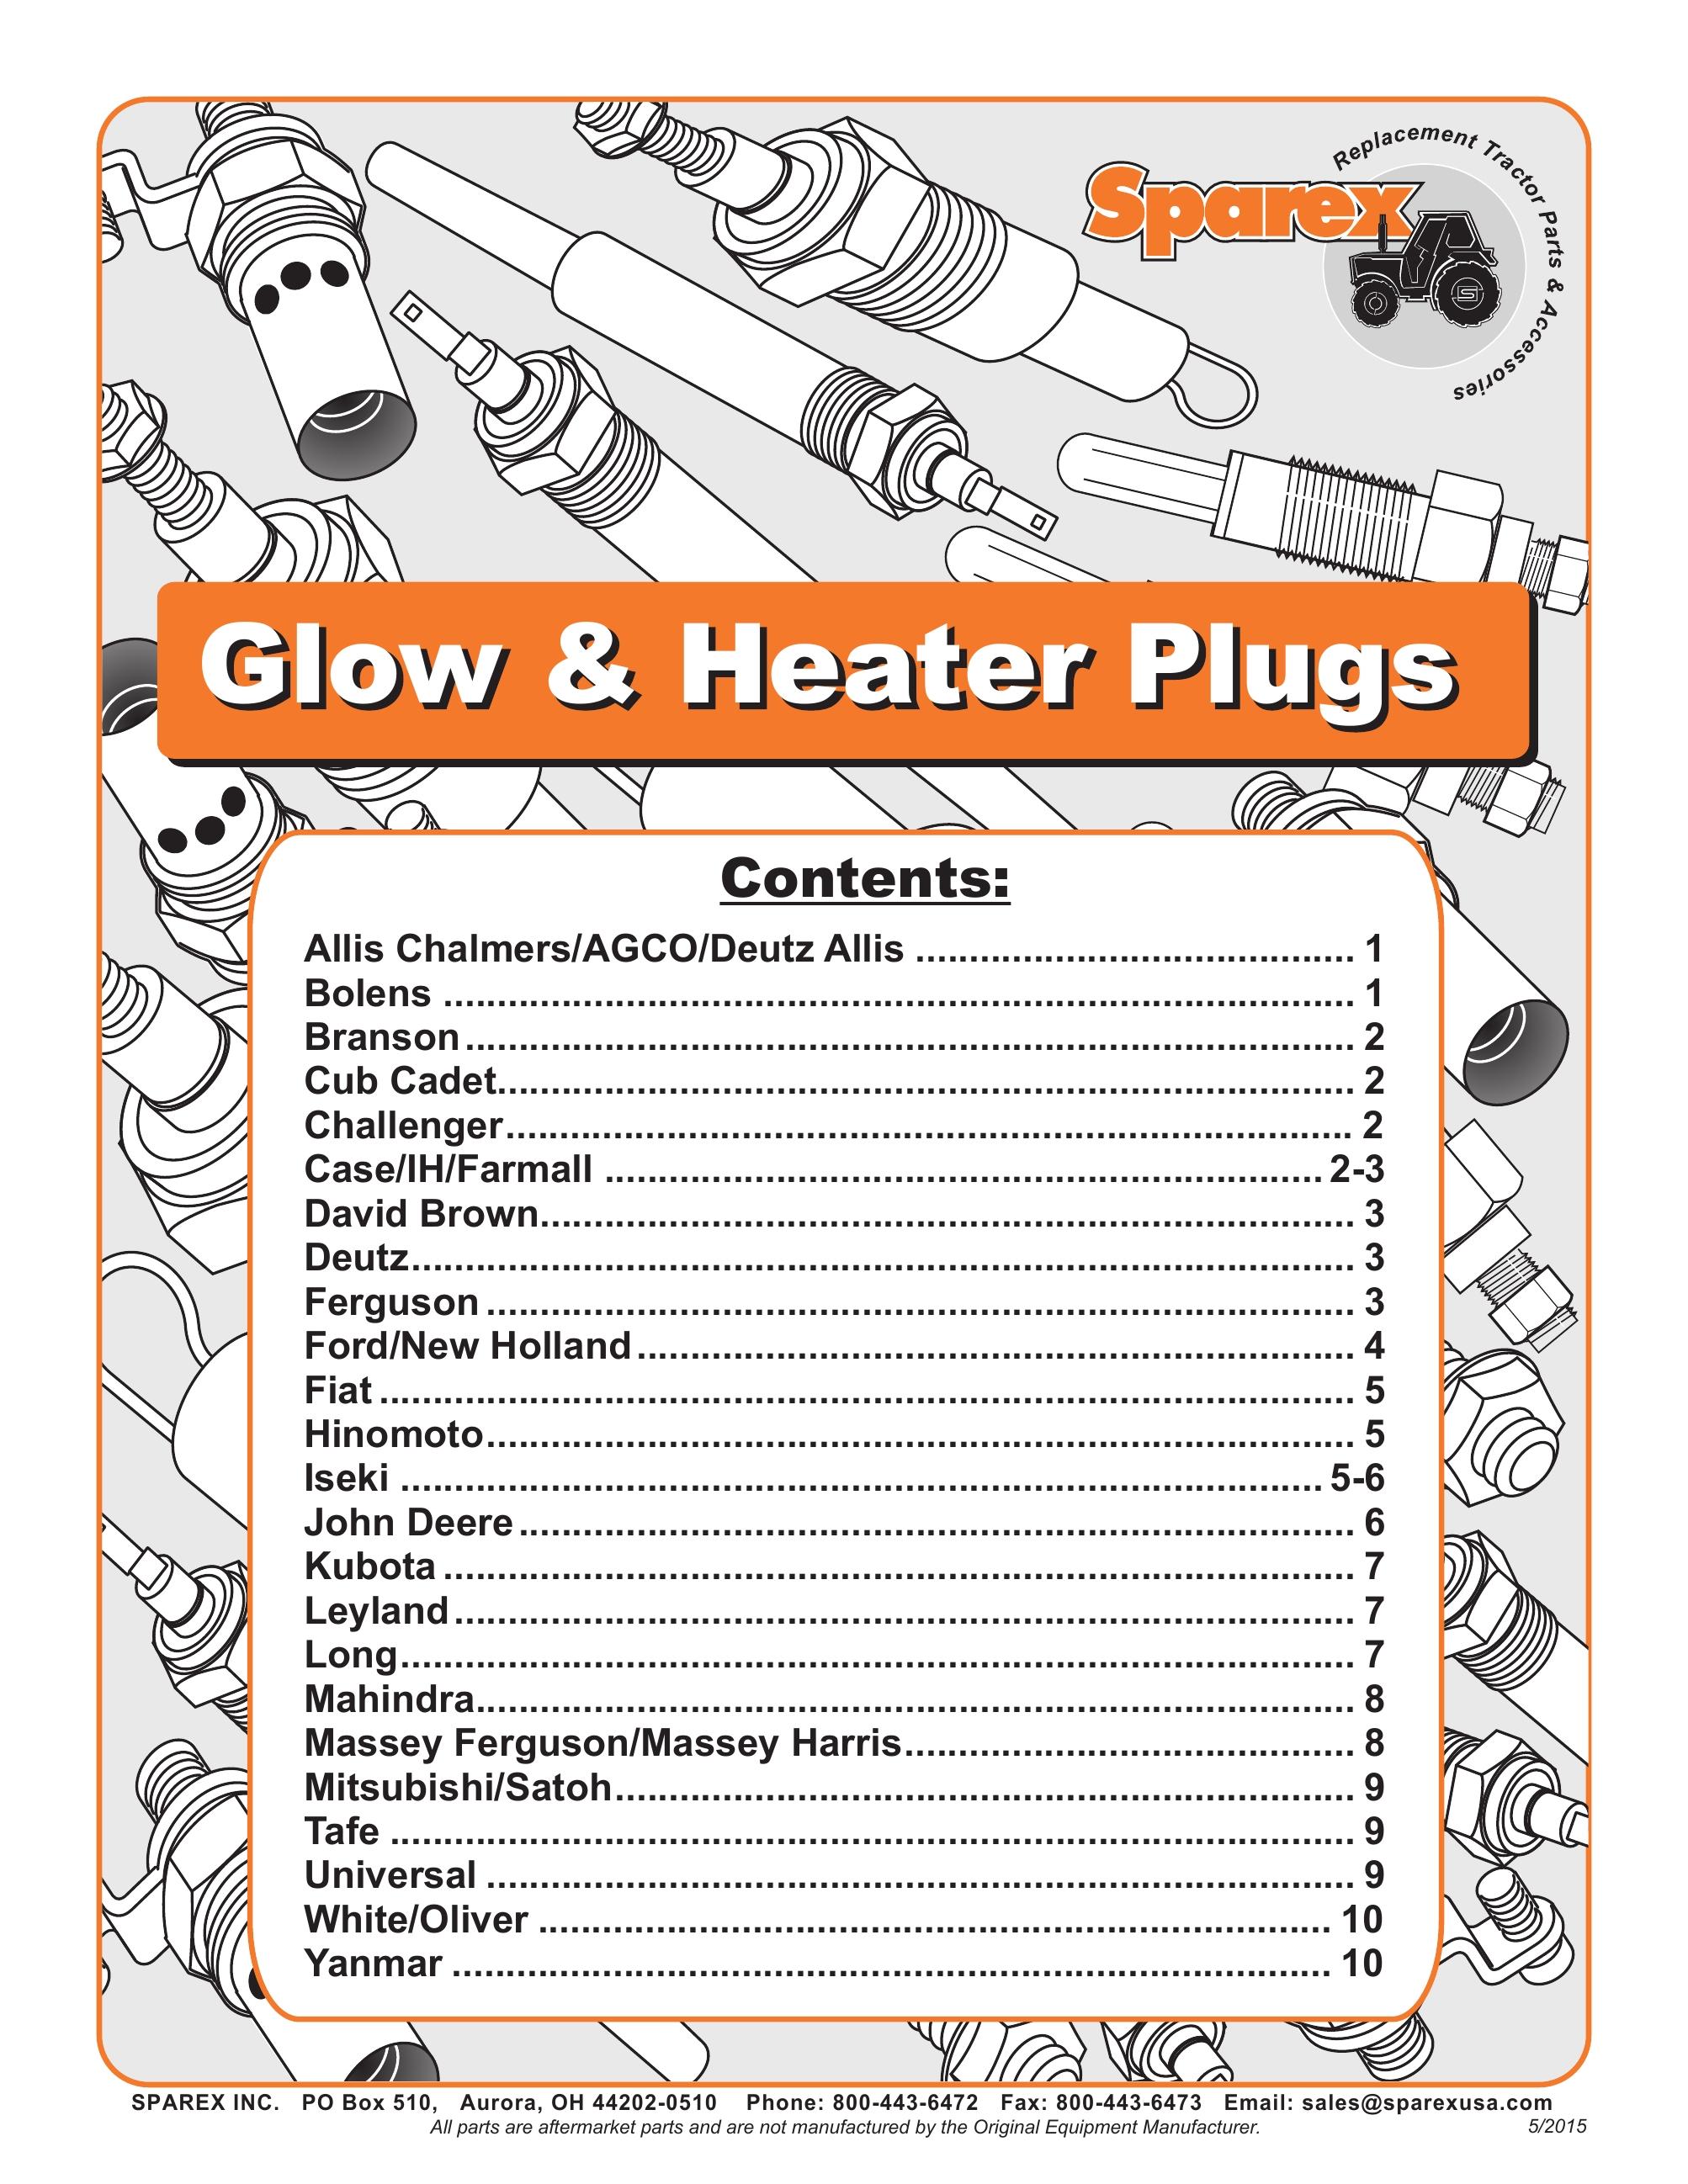 Sparex Catalogs Massey Harris Wiring Diagrams S700387 Glow Heater Plugs